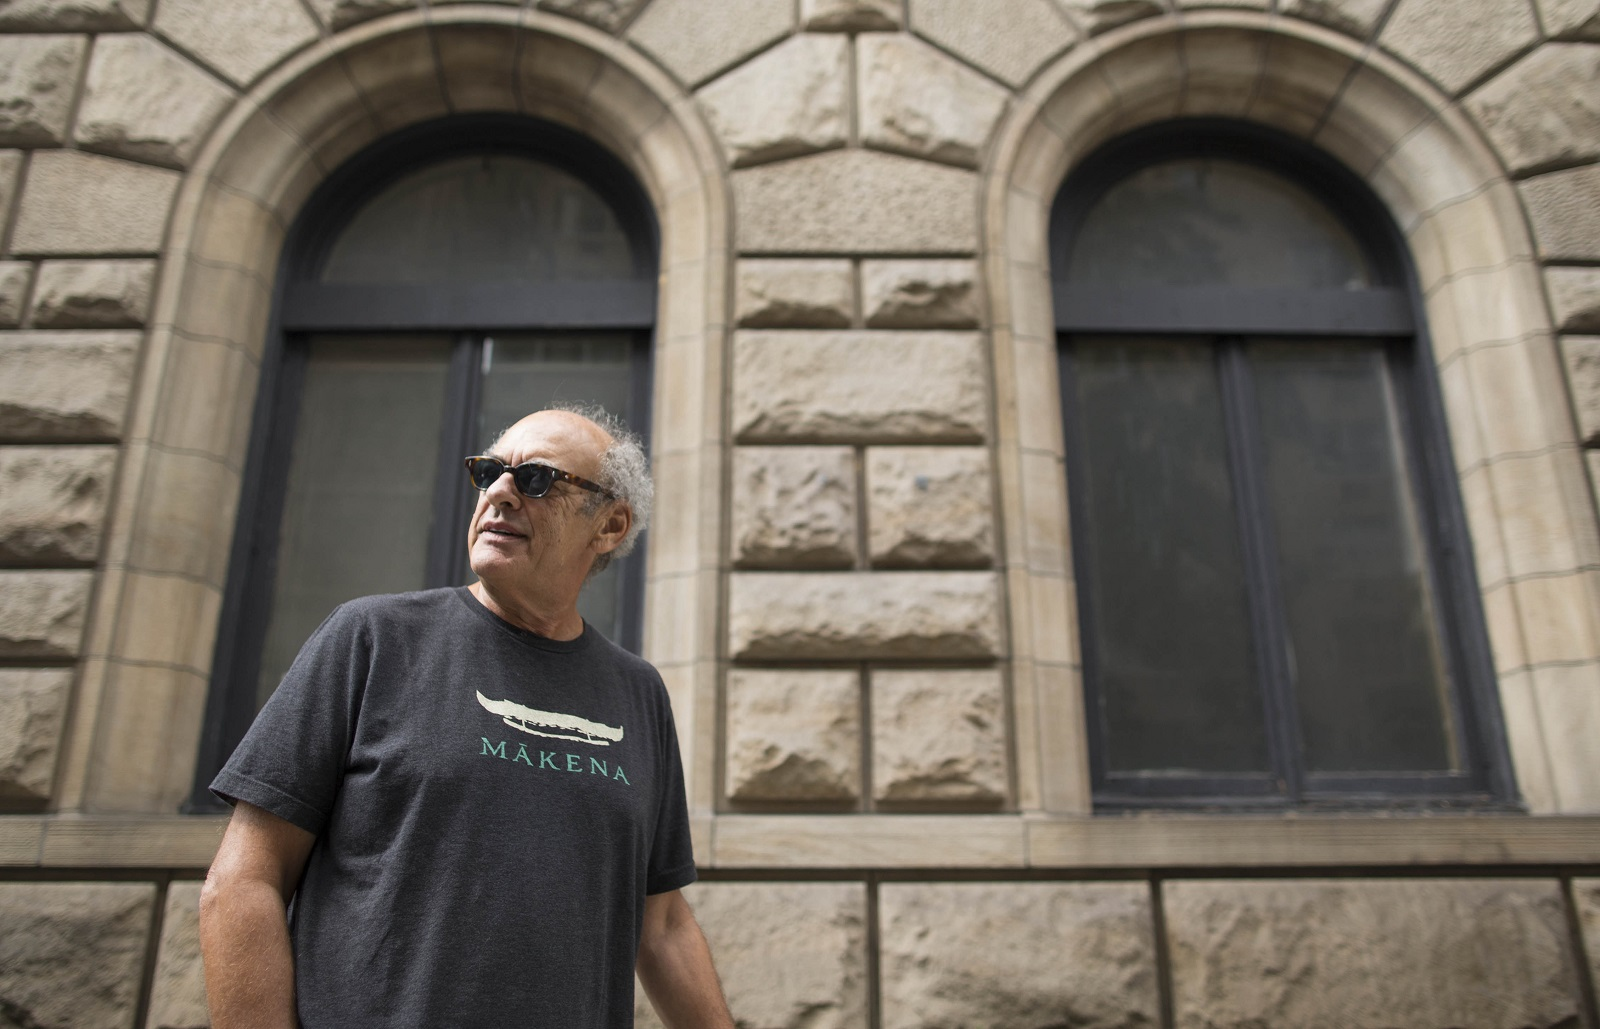 Legendary producer Shep Gordon walks on Lexington Avenue in New York City. (Derek Gee/Buffalo News)